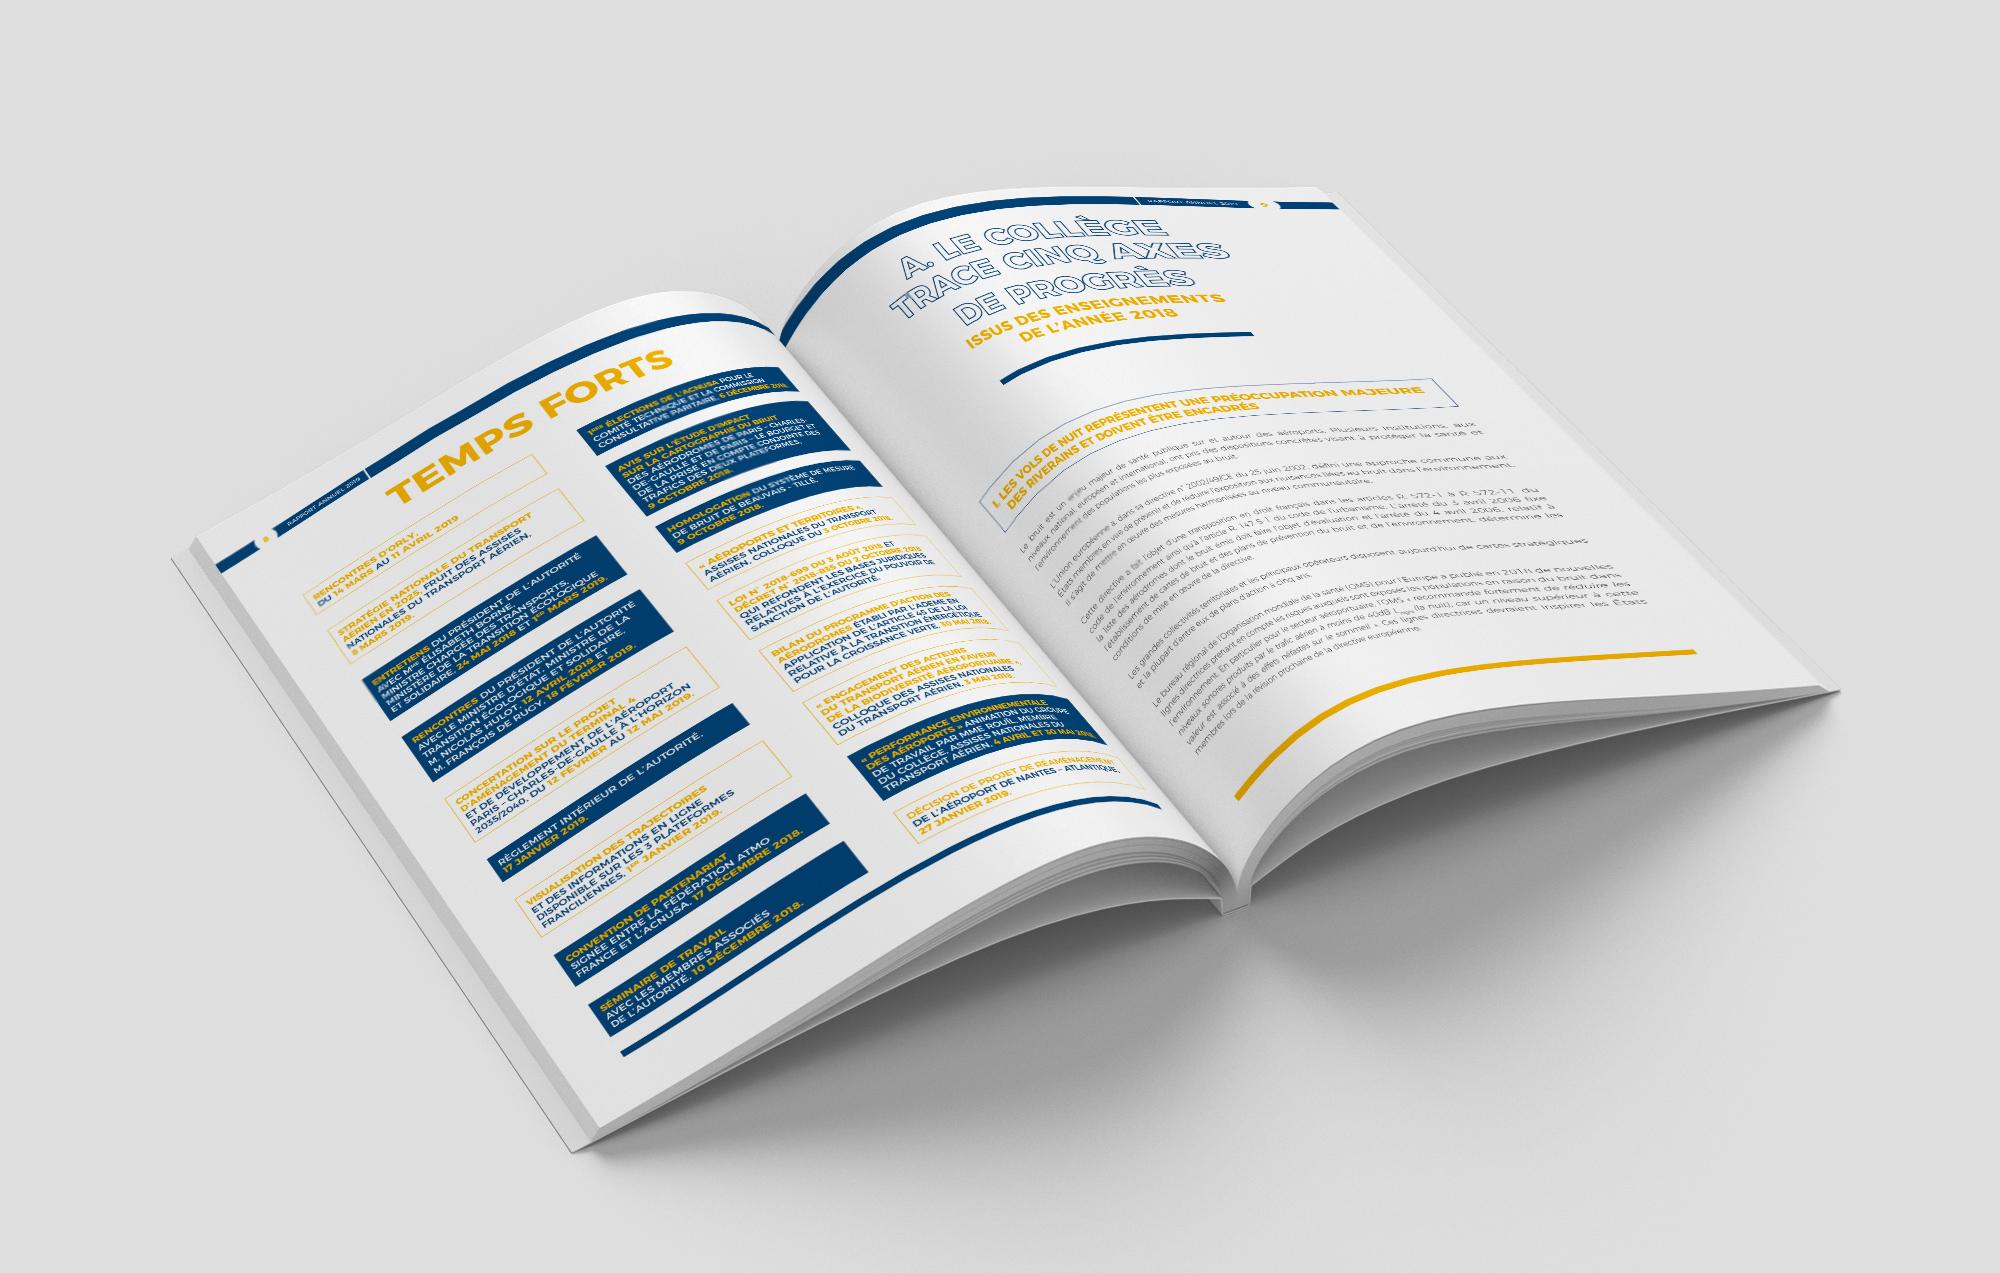 ACNUSA-Rapport-annuel-2019-conception-wala-studio-graphique3